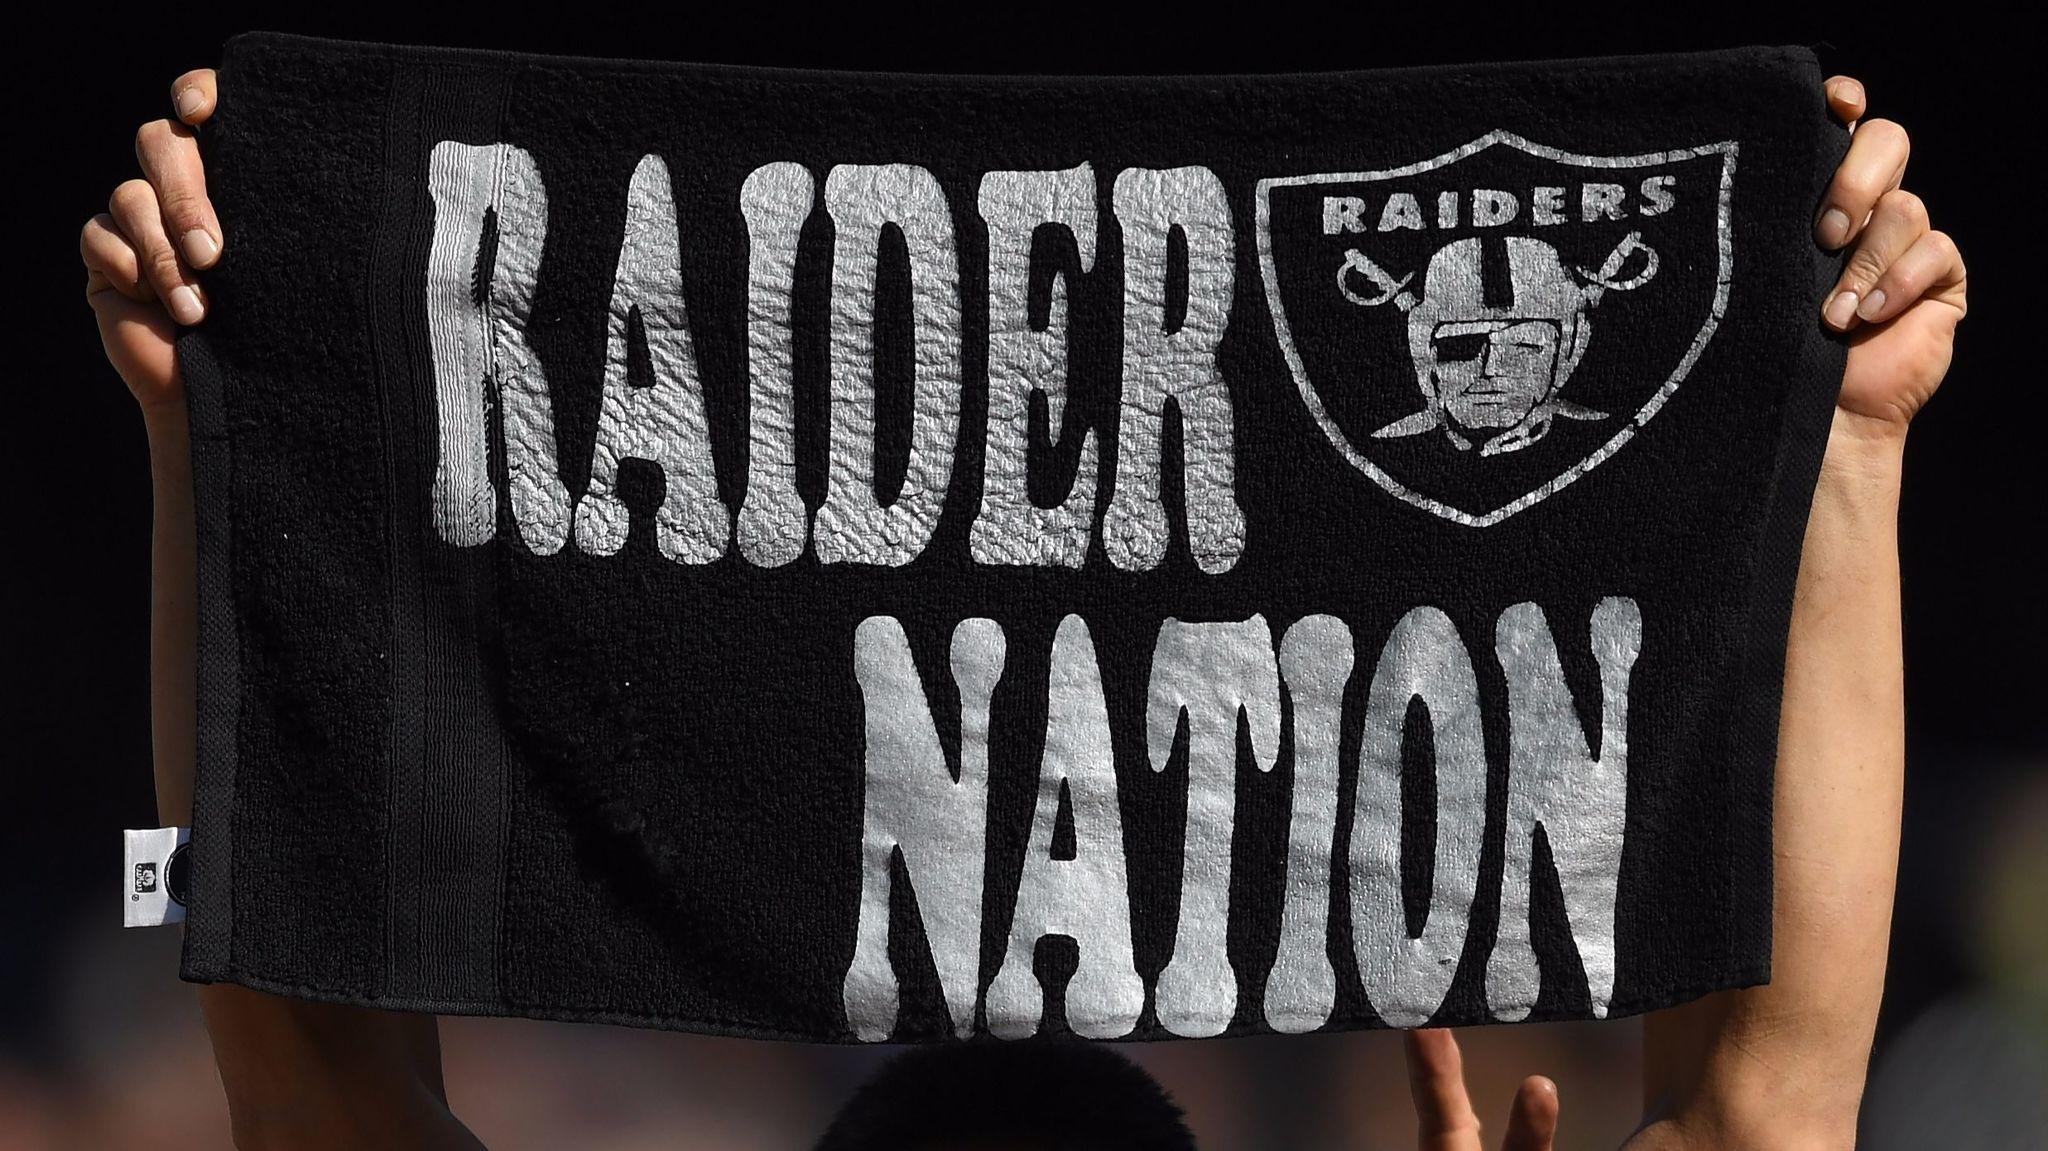 Raiders Game Reveals Depth Of Anti Spanos Sentiment For S